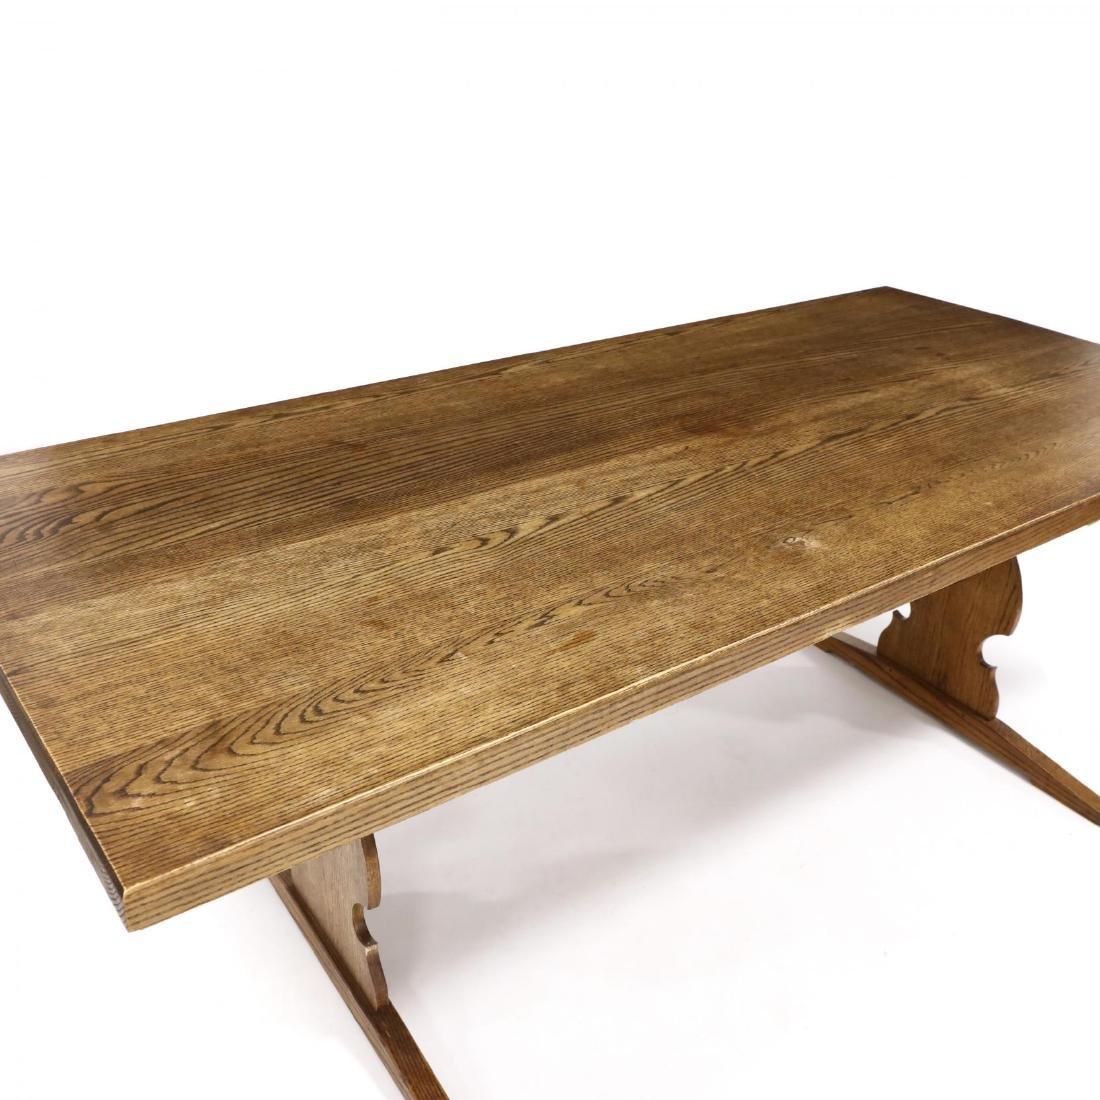 Bob Trotman, Custom Oak Trestle Base Dining Table - 2